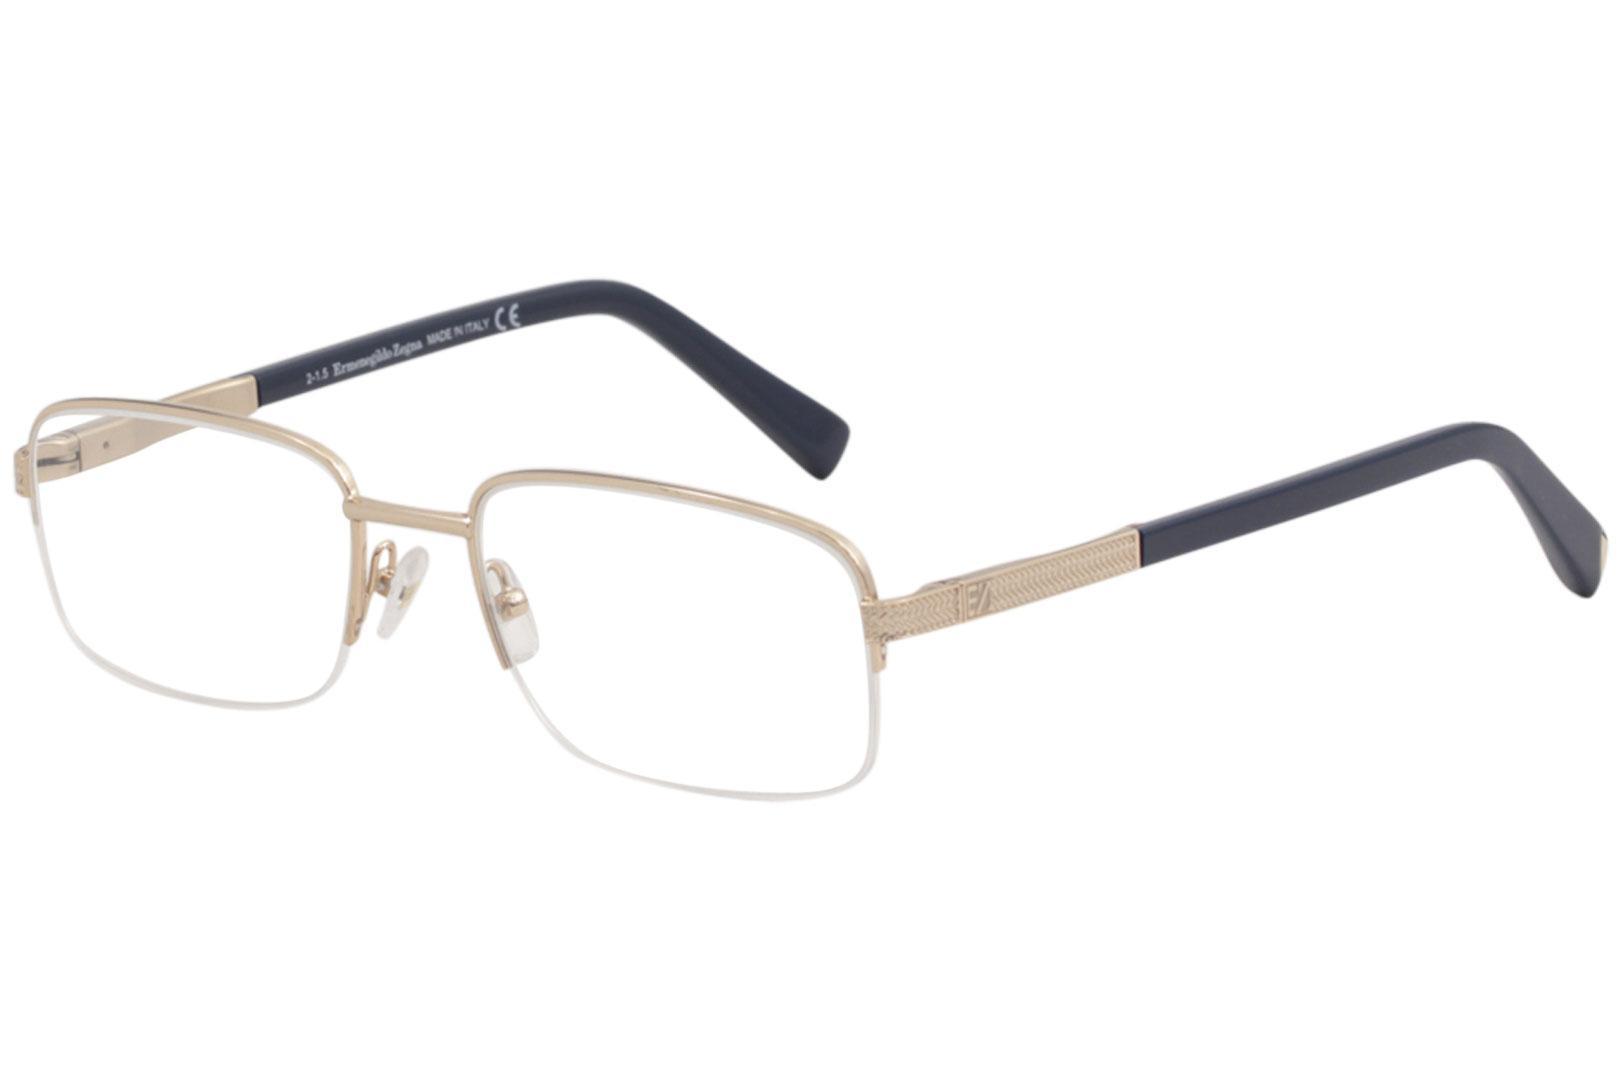 e121426fba2 Ermenegildo Zegna Men s Eyeglasses EZ5011 EZ 5011 Half Rim Optical Frame